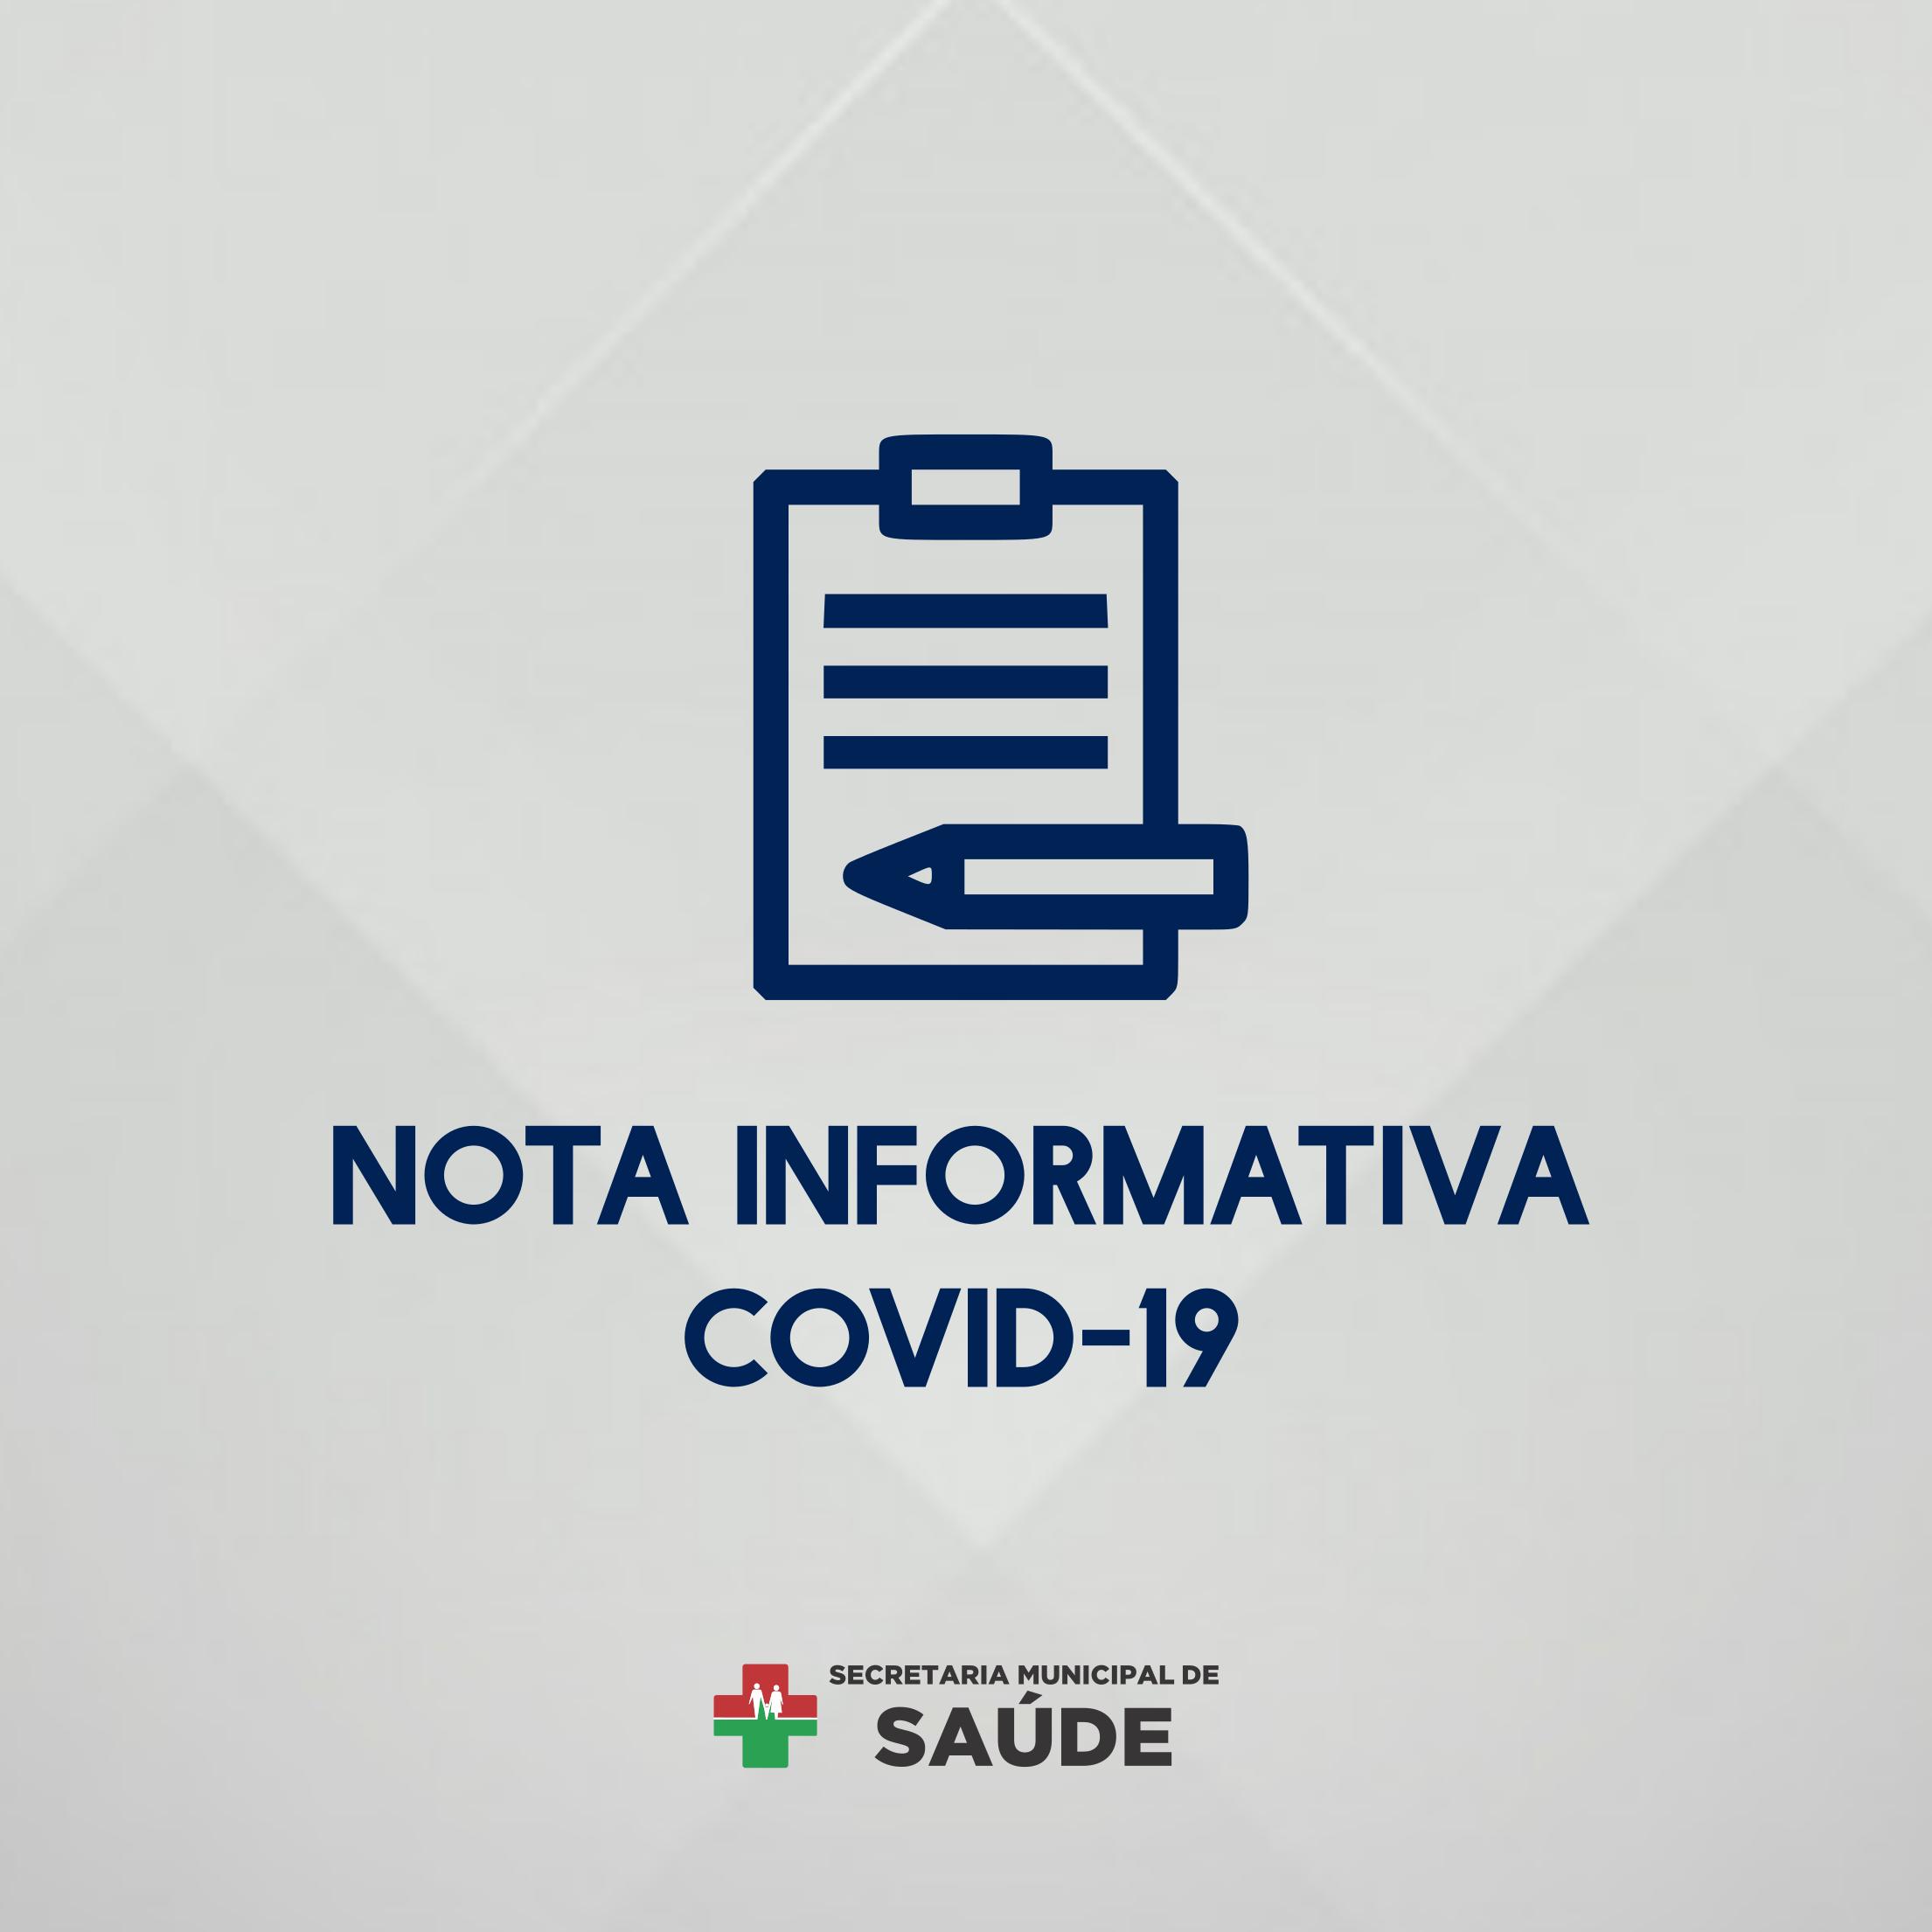 NOTA INFORMATIVA Nº 56/2021 (COVID-19)